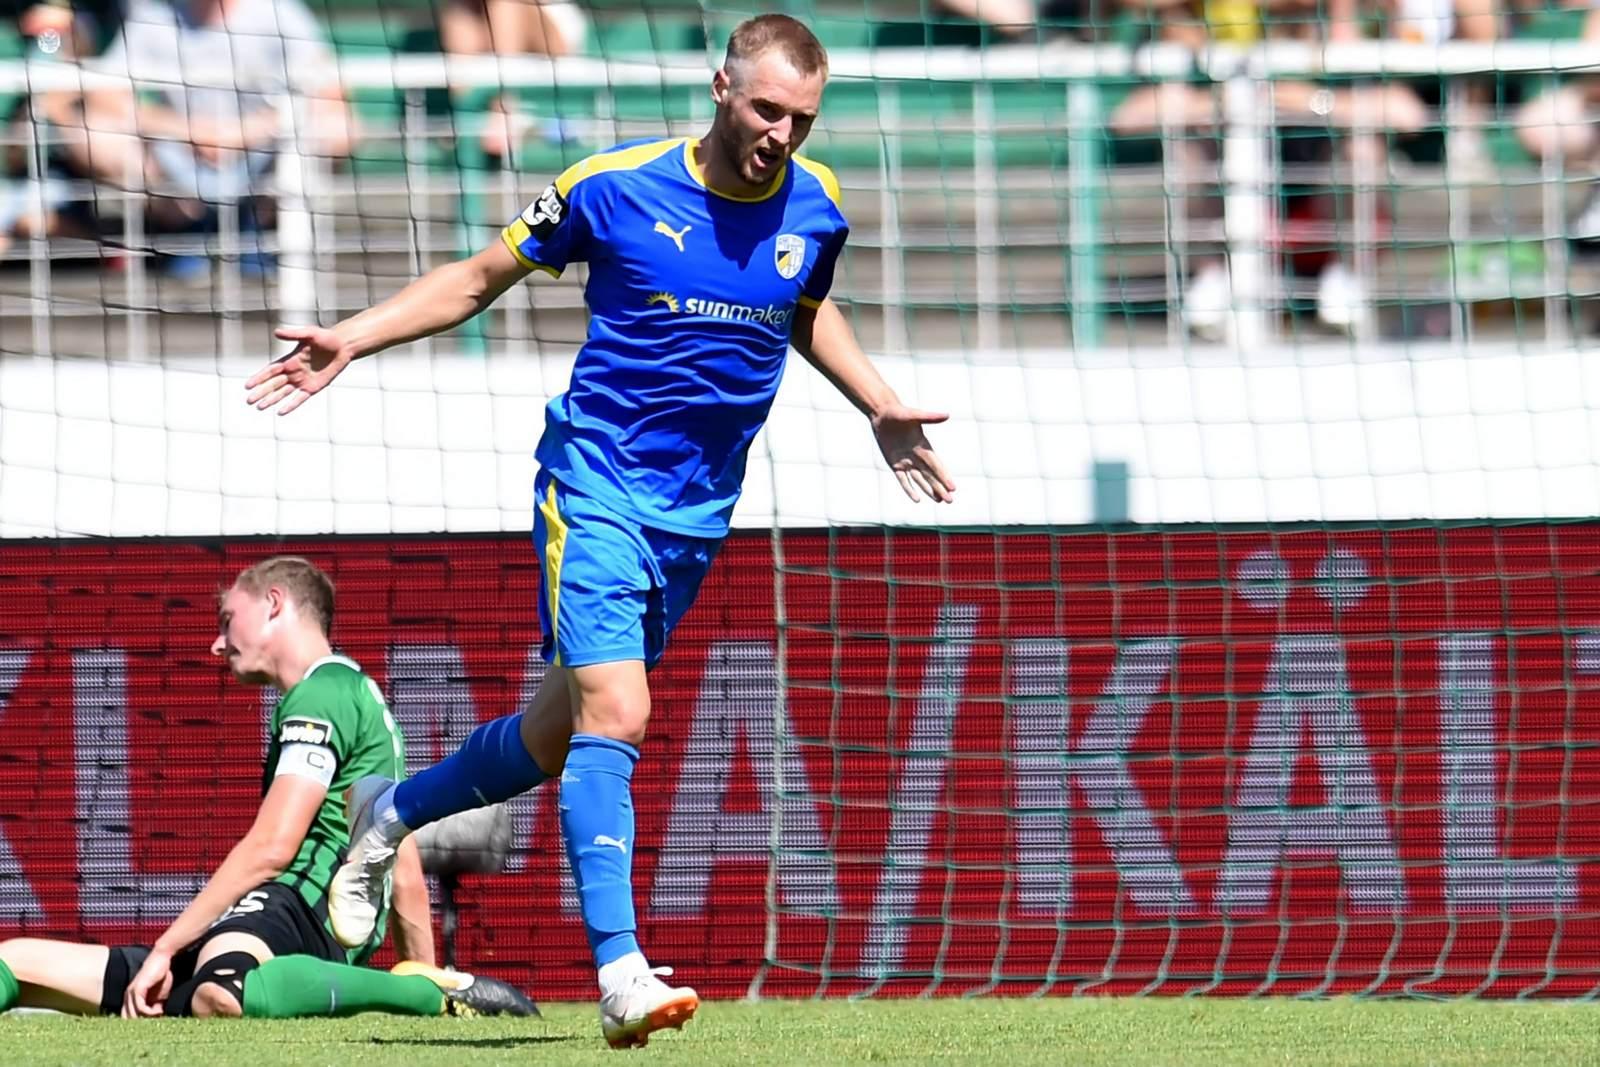 Felix Brügmann vom FC Carl zeiss Jena